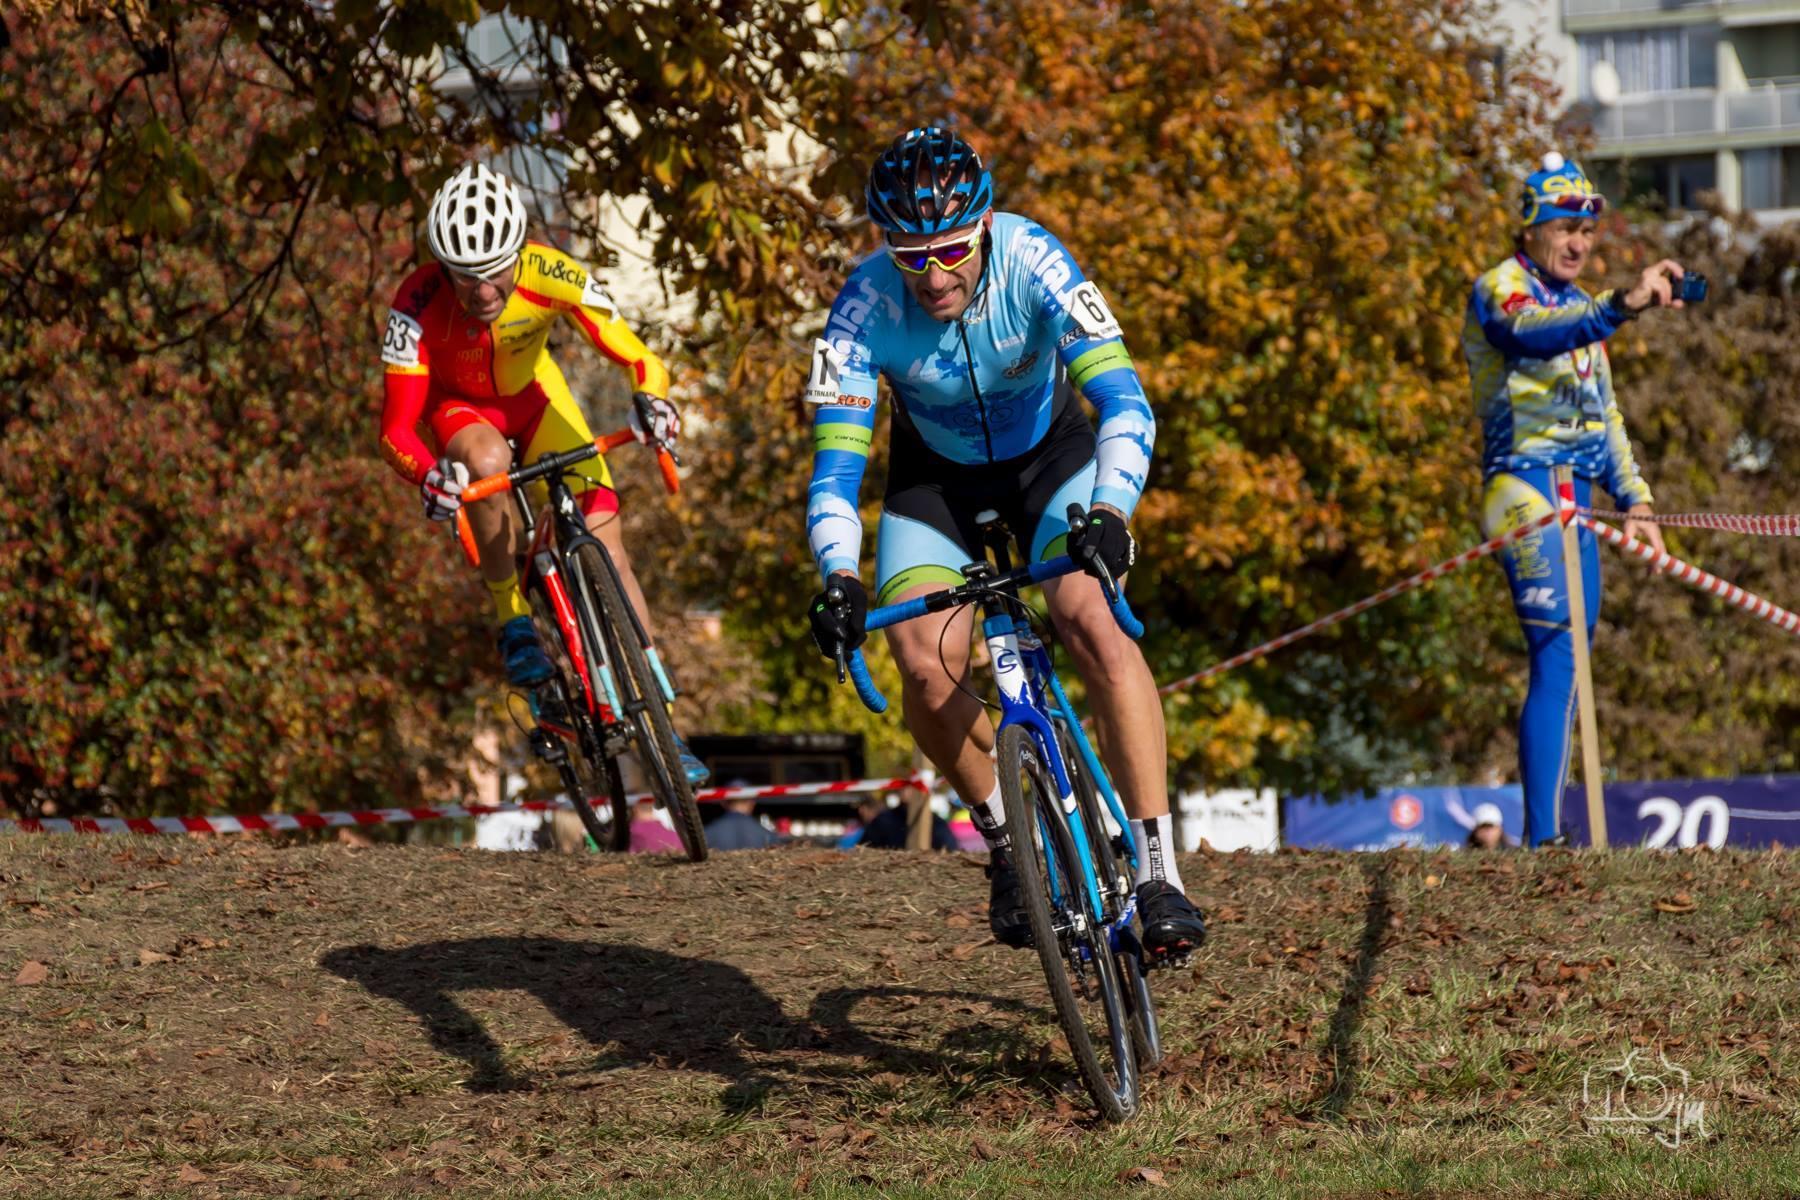 Jakub Wolcendorf (Jakoobcycles.com) – Mistrzostwa Europy Masters CX, Trnava